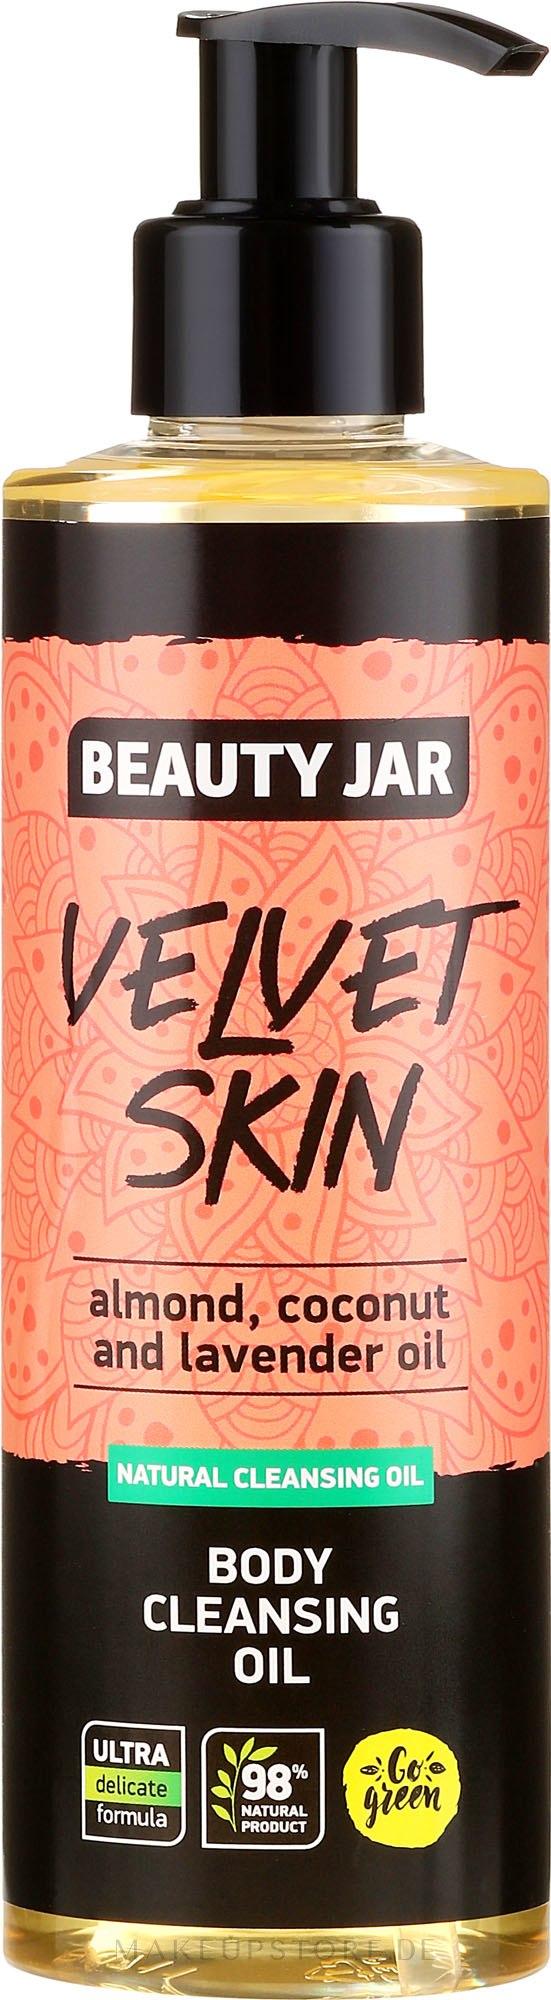 Körperreinigungsöl mit Mandel-, Kokos- und Lavendelöl - Beauty Jar Velvet Skin Body Cleansing Oil — Bild 250 ml